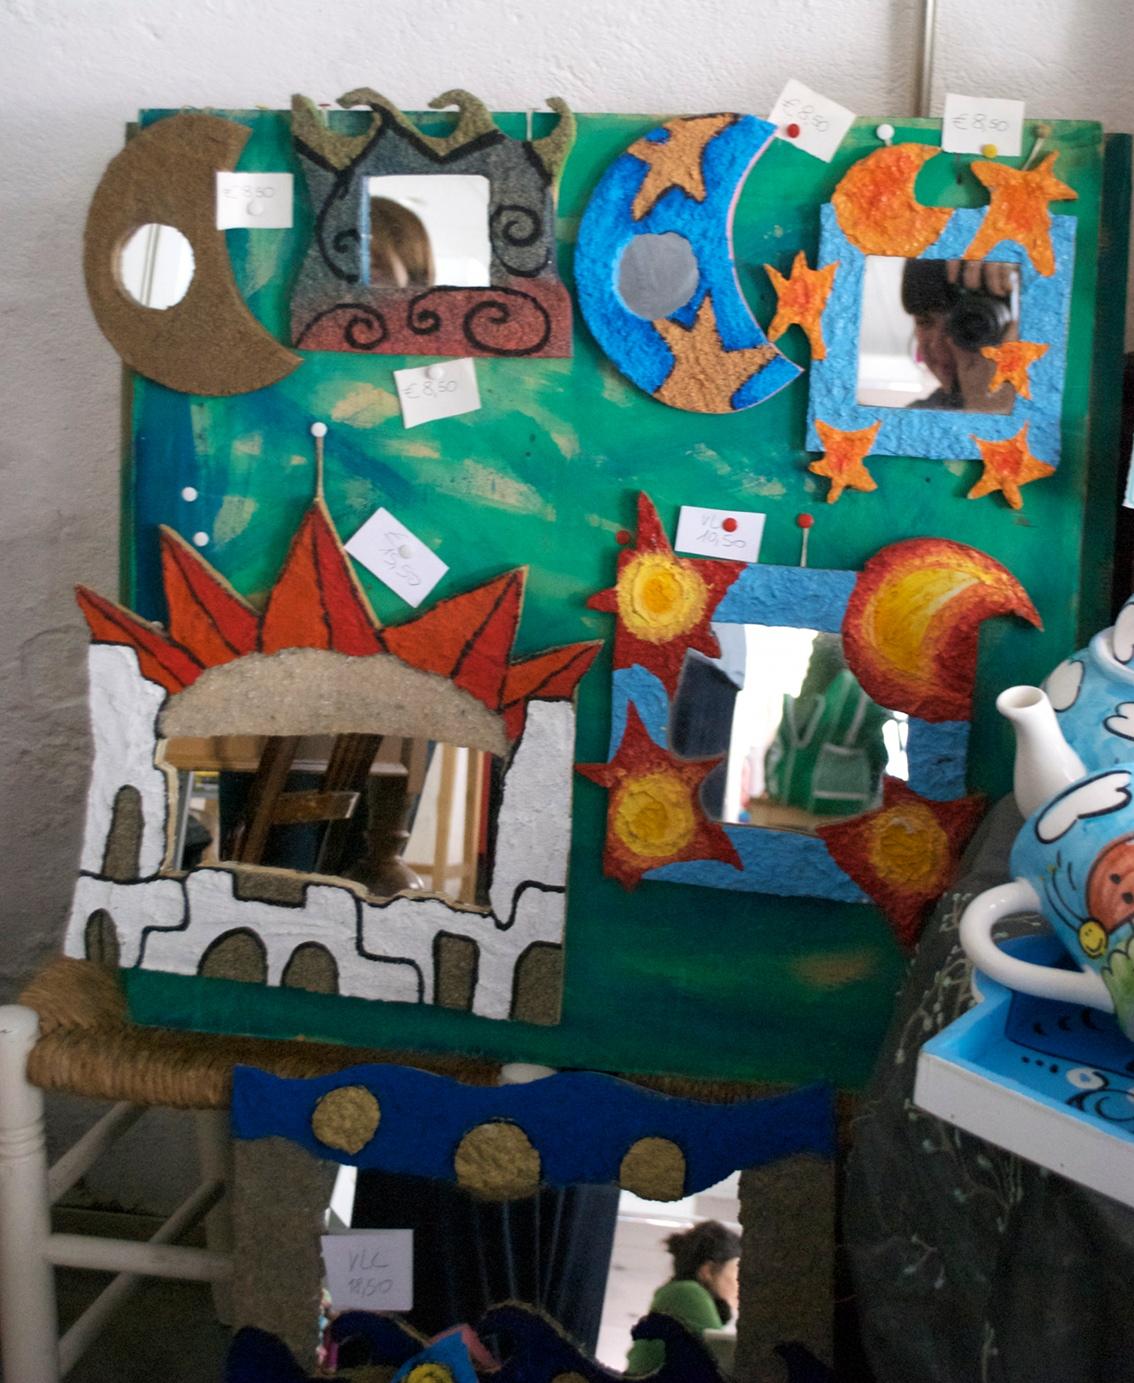 La paquita maggio 2012 - Muebles fym ...